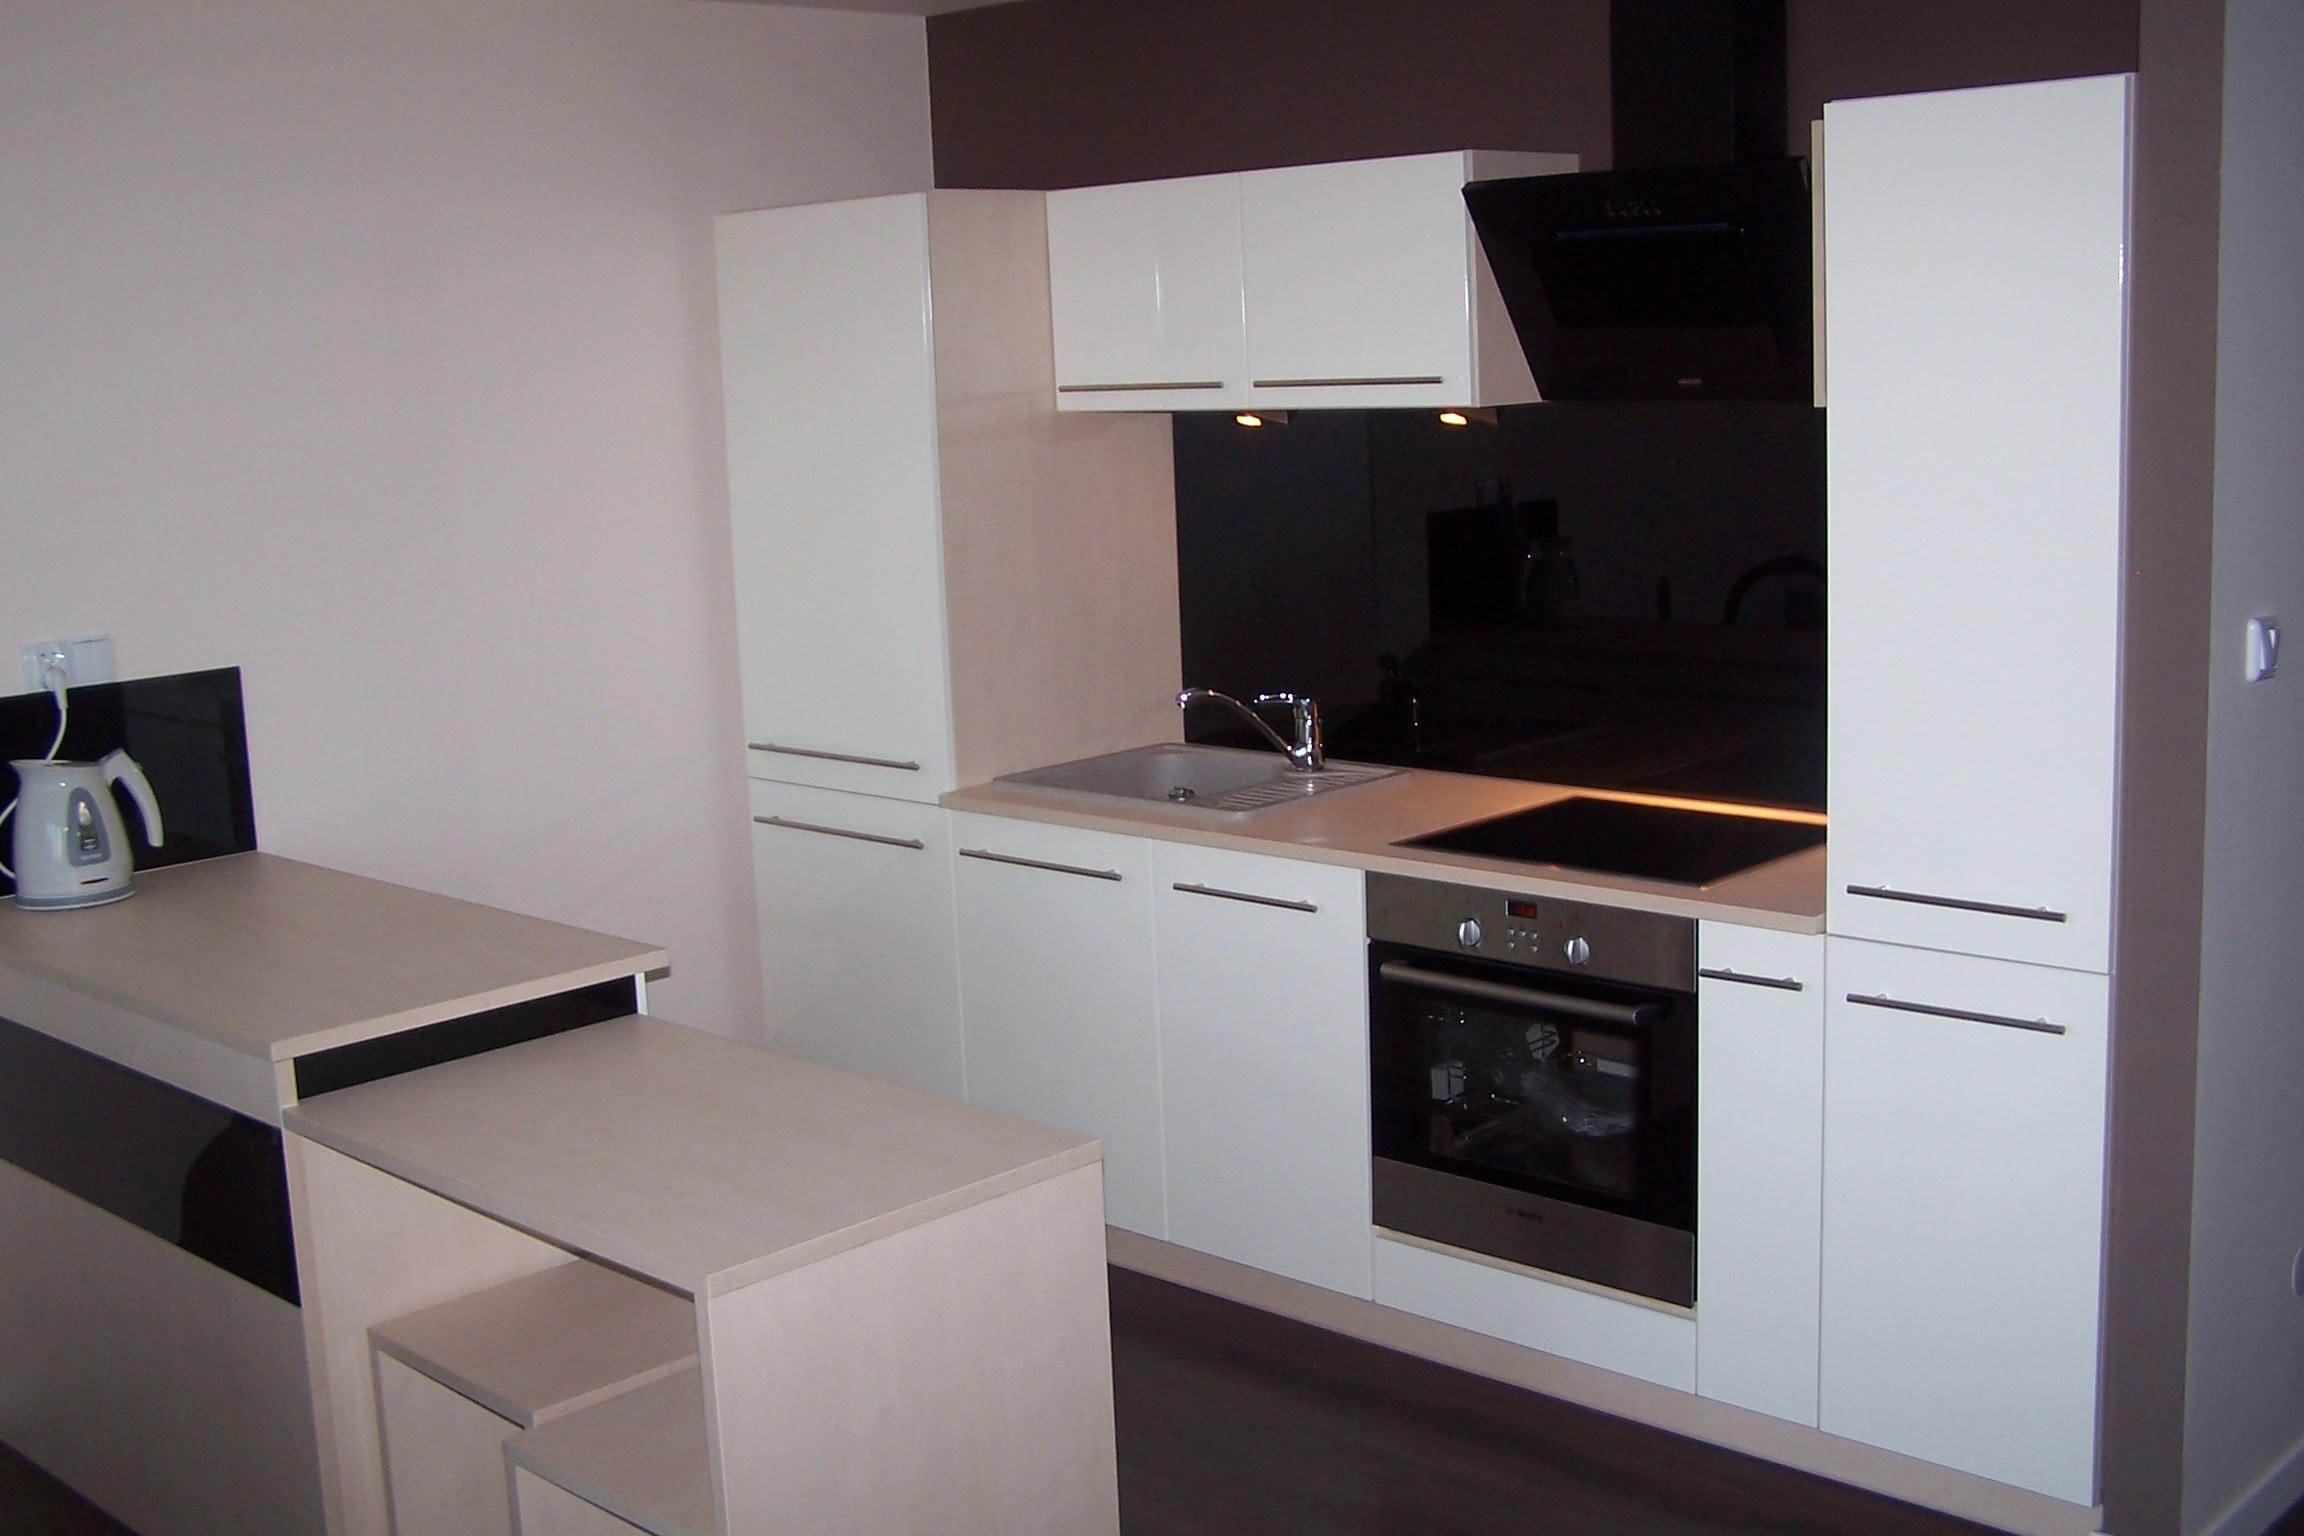 meble kuchenne i inne zabudowy szczecin zachodniopomorskie. Black Bedroom Furniture Sets. Home Design Ideas